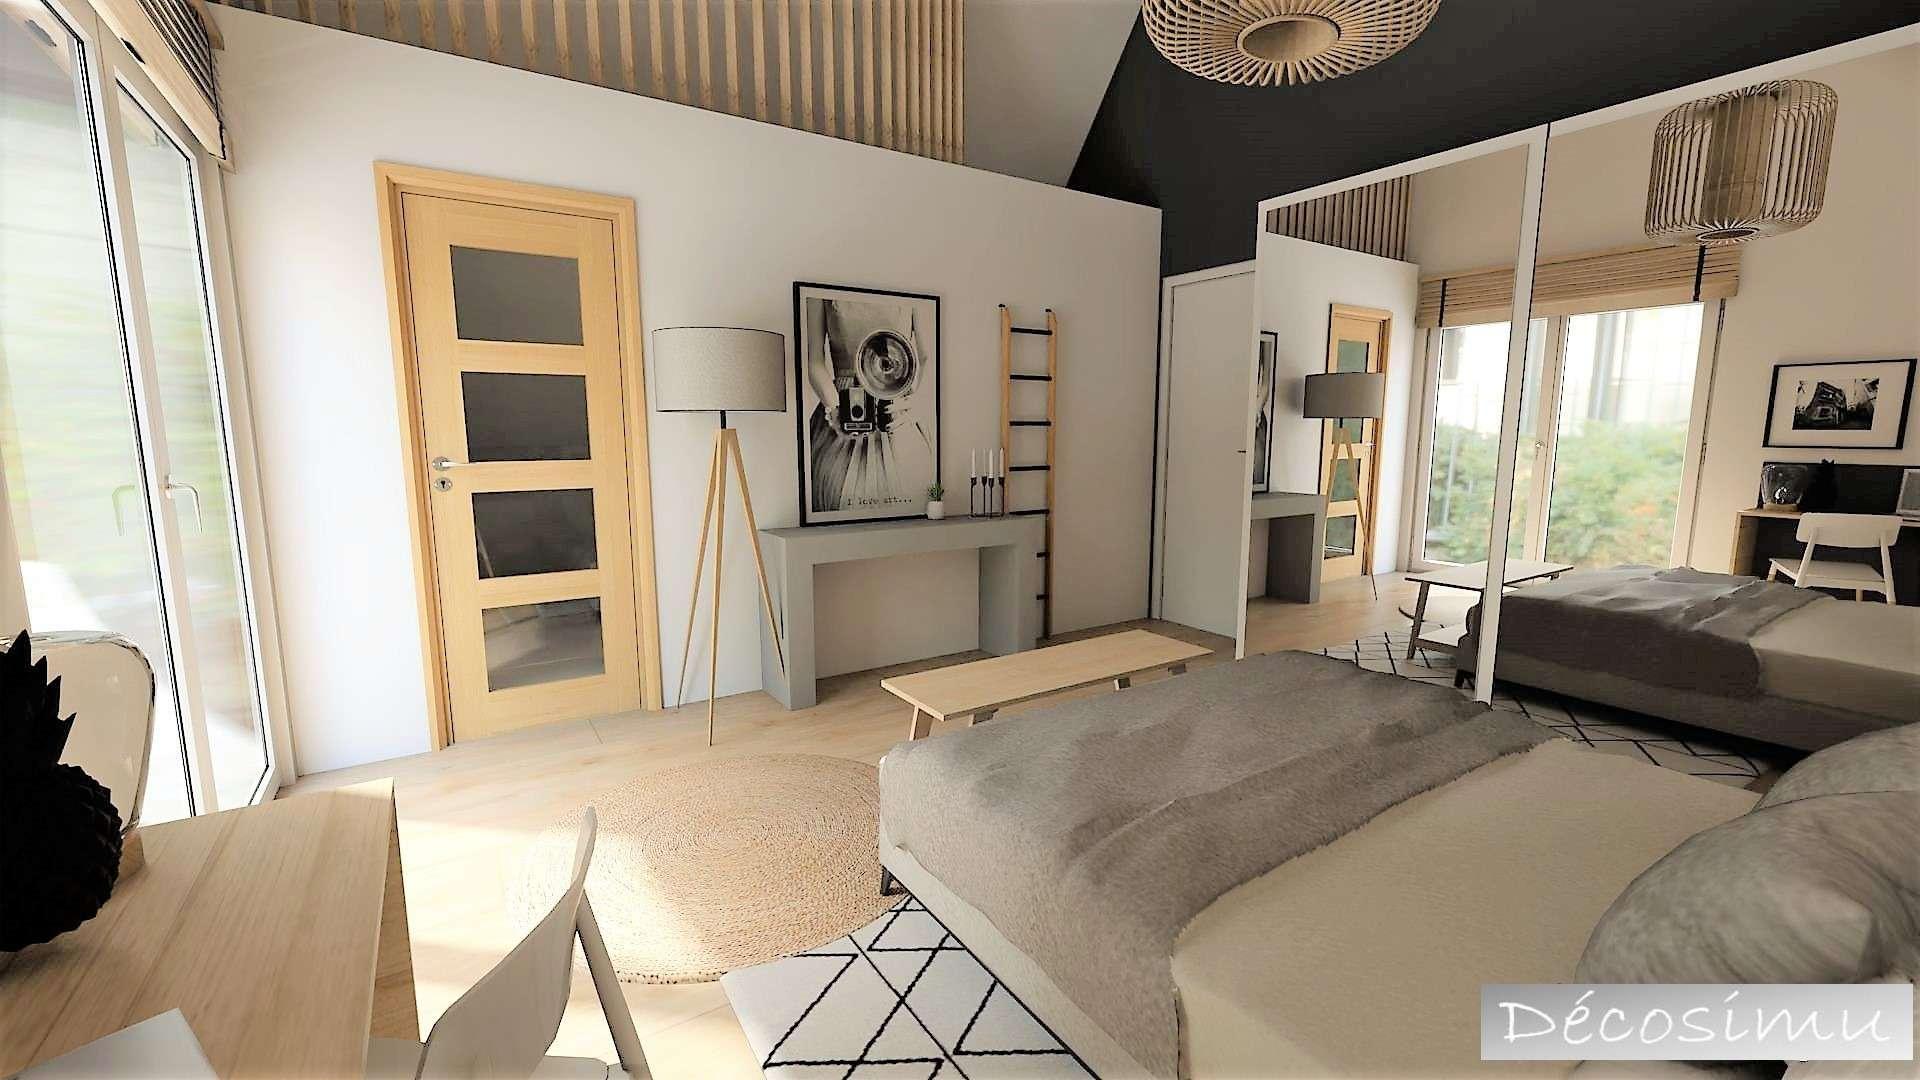 Chambre vue 3D